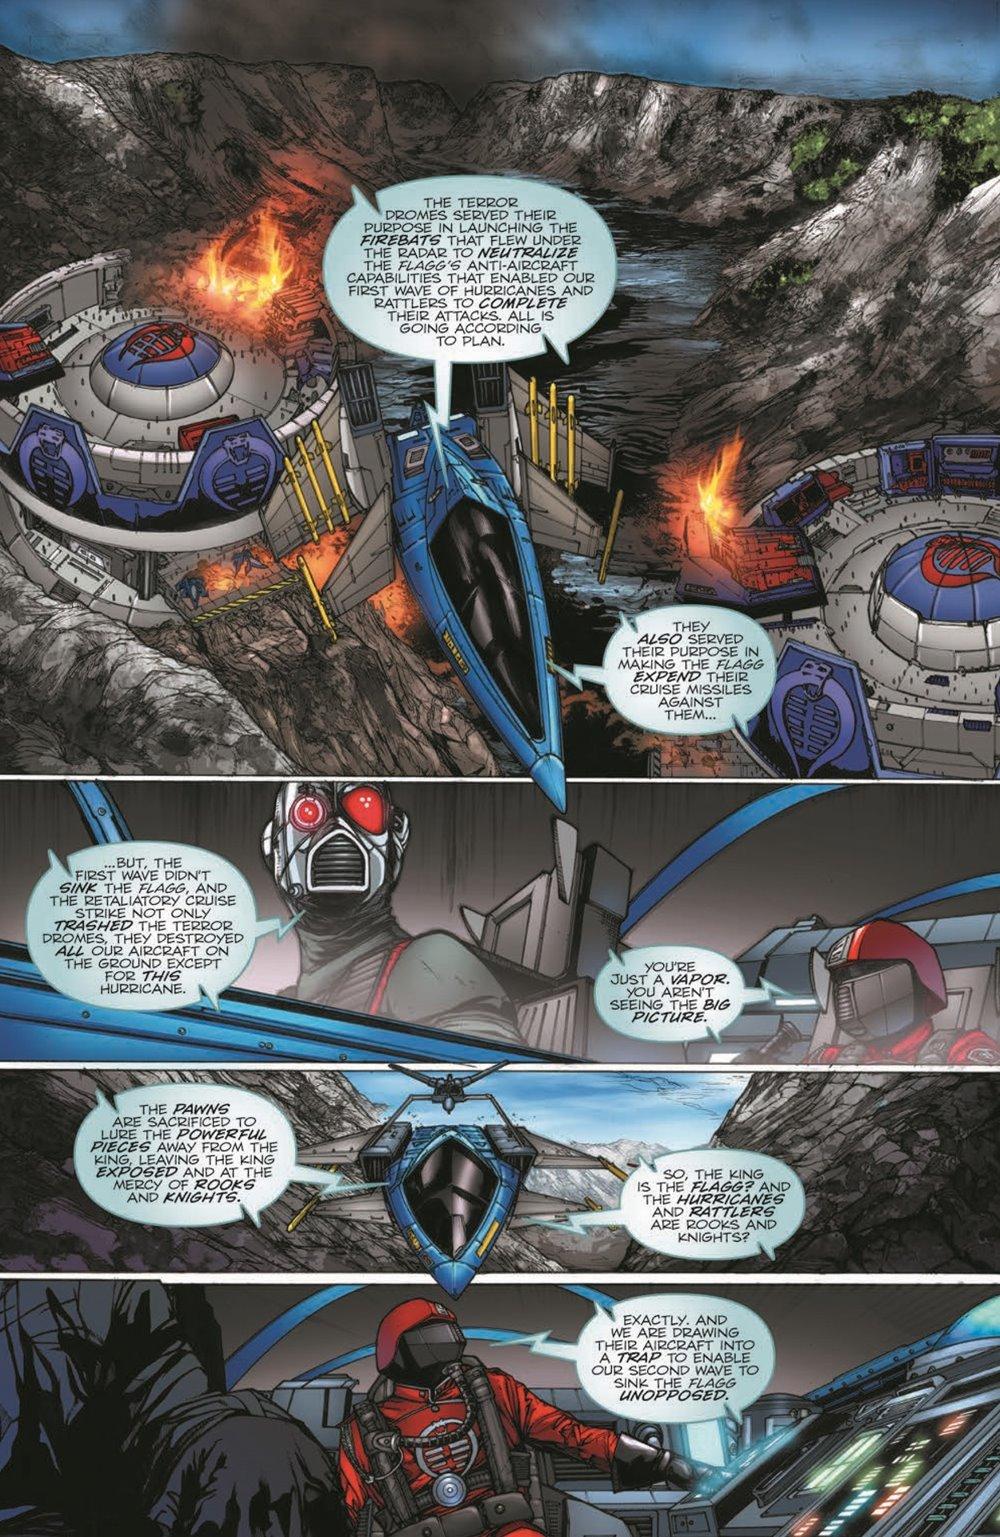 GIJoeRAH279-pr-6 ComicList Previews: G.I. JOE A REAL AMERICAN HERO #279